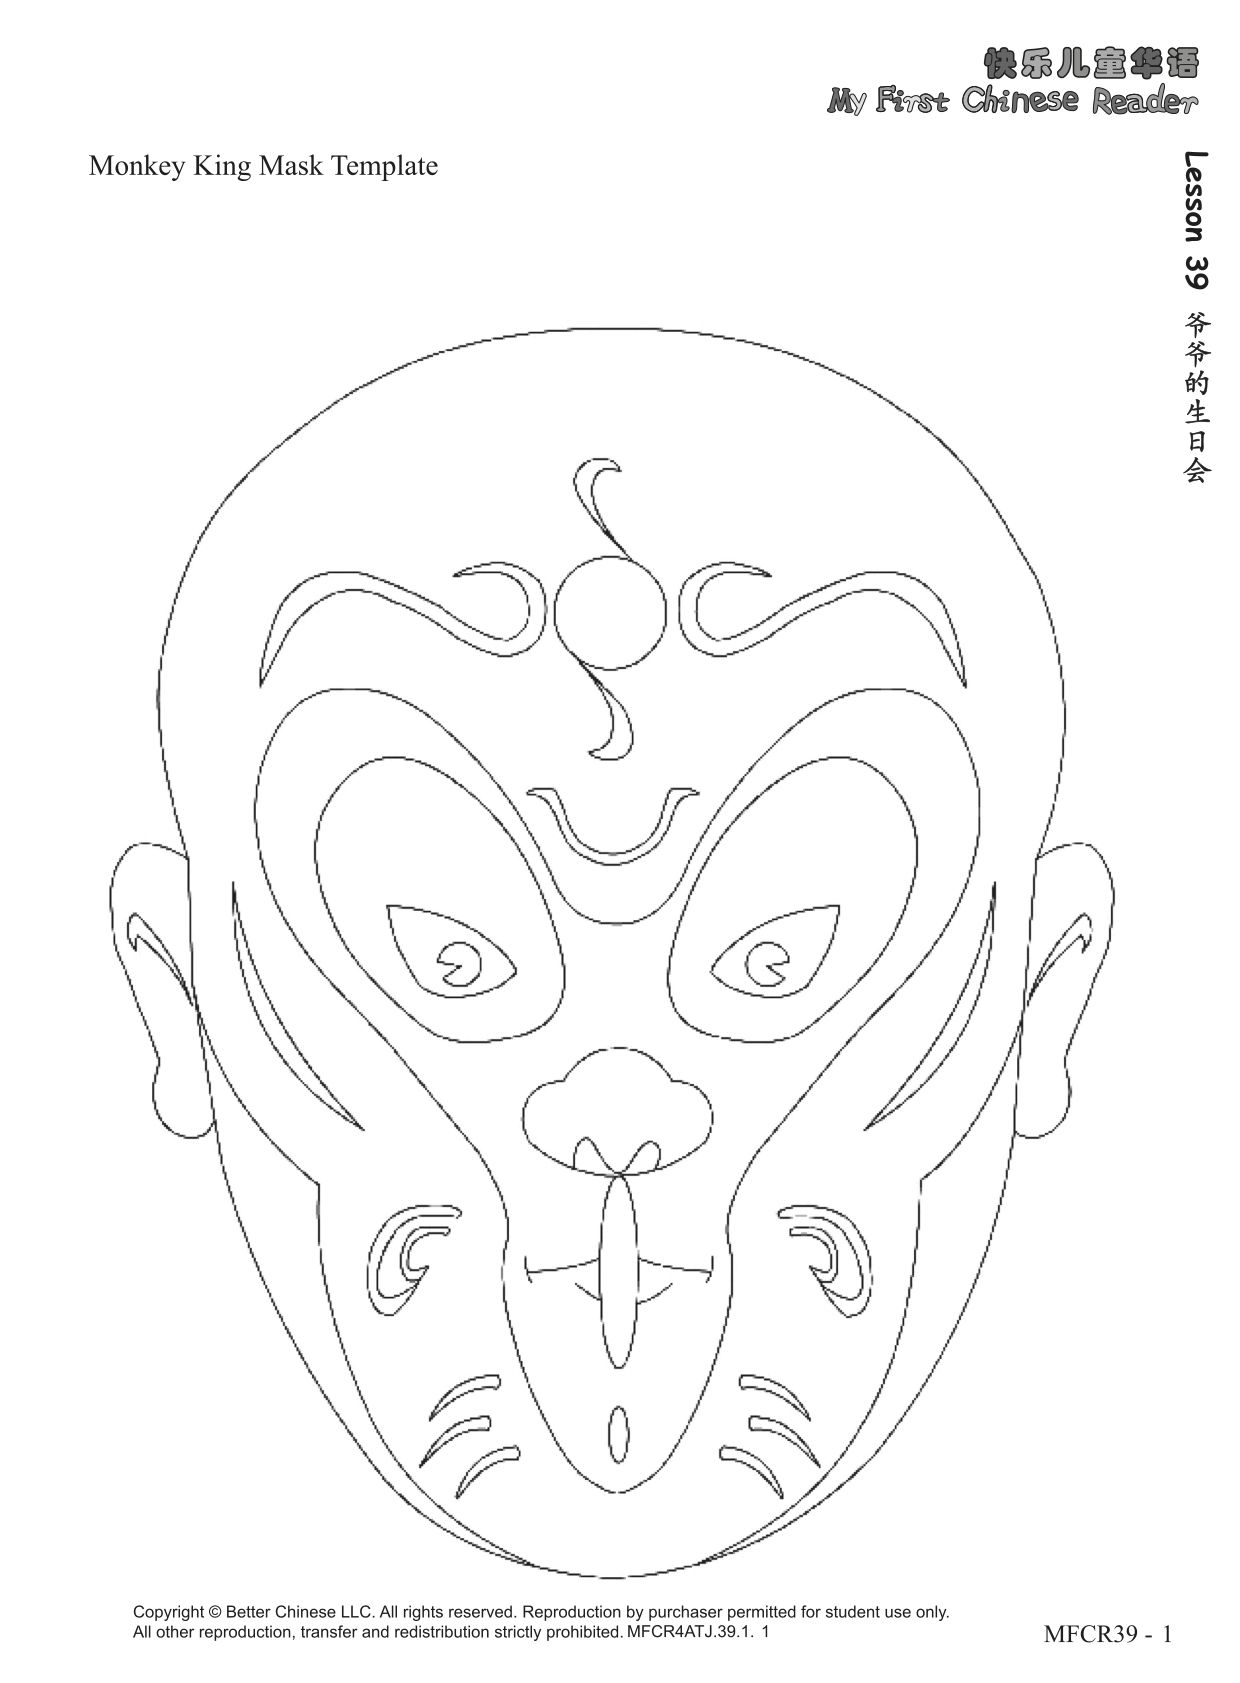 Monkey King Mask Template